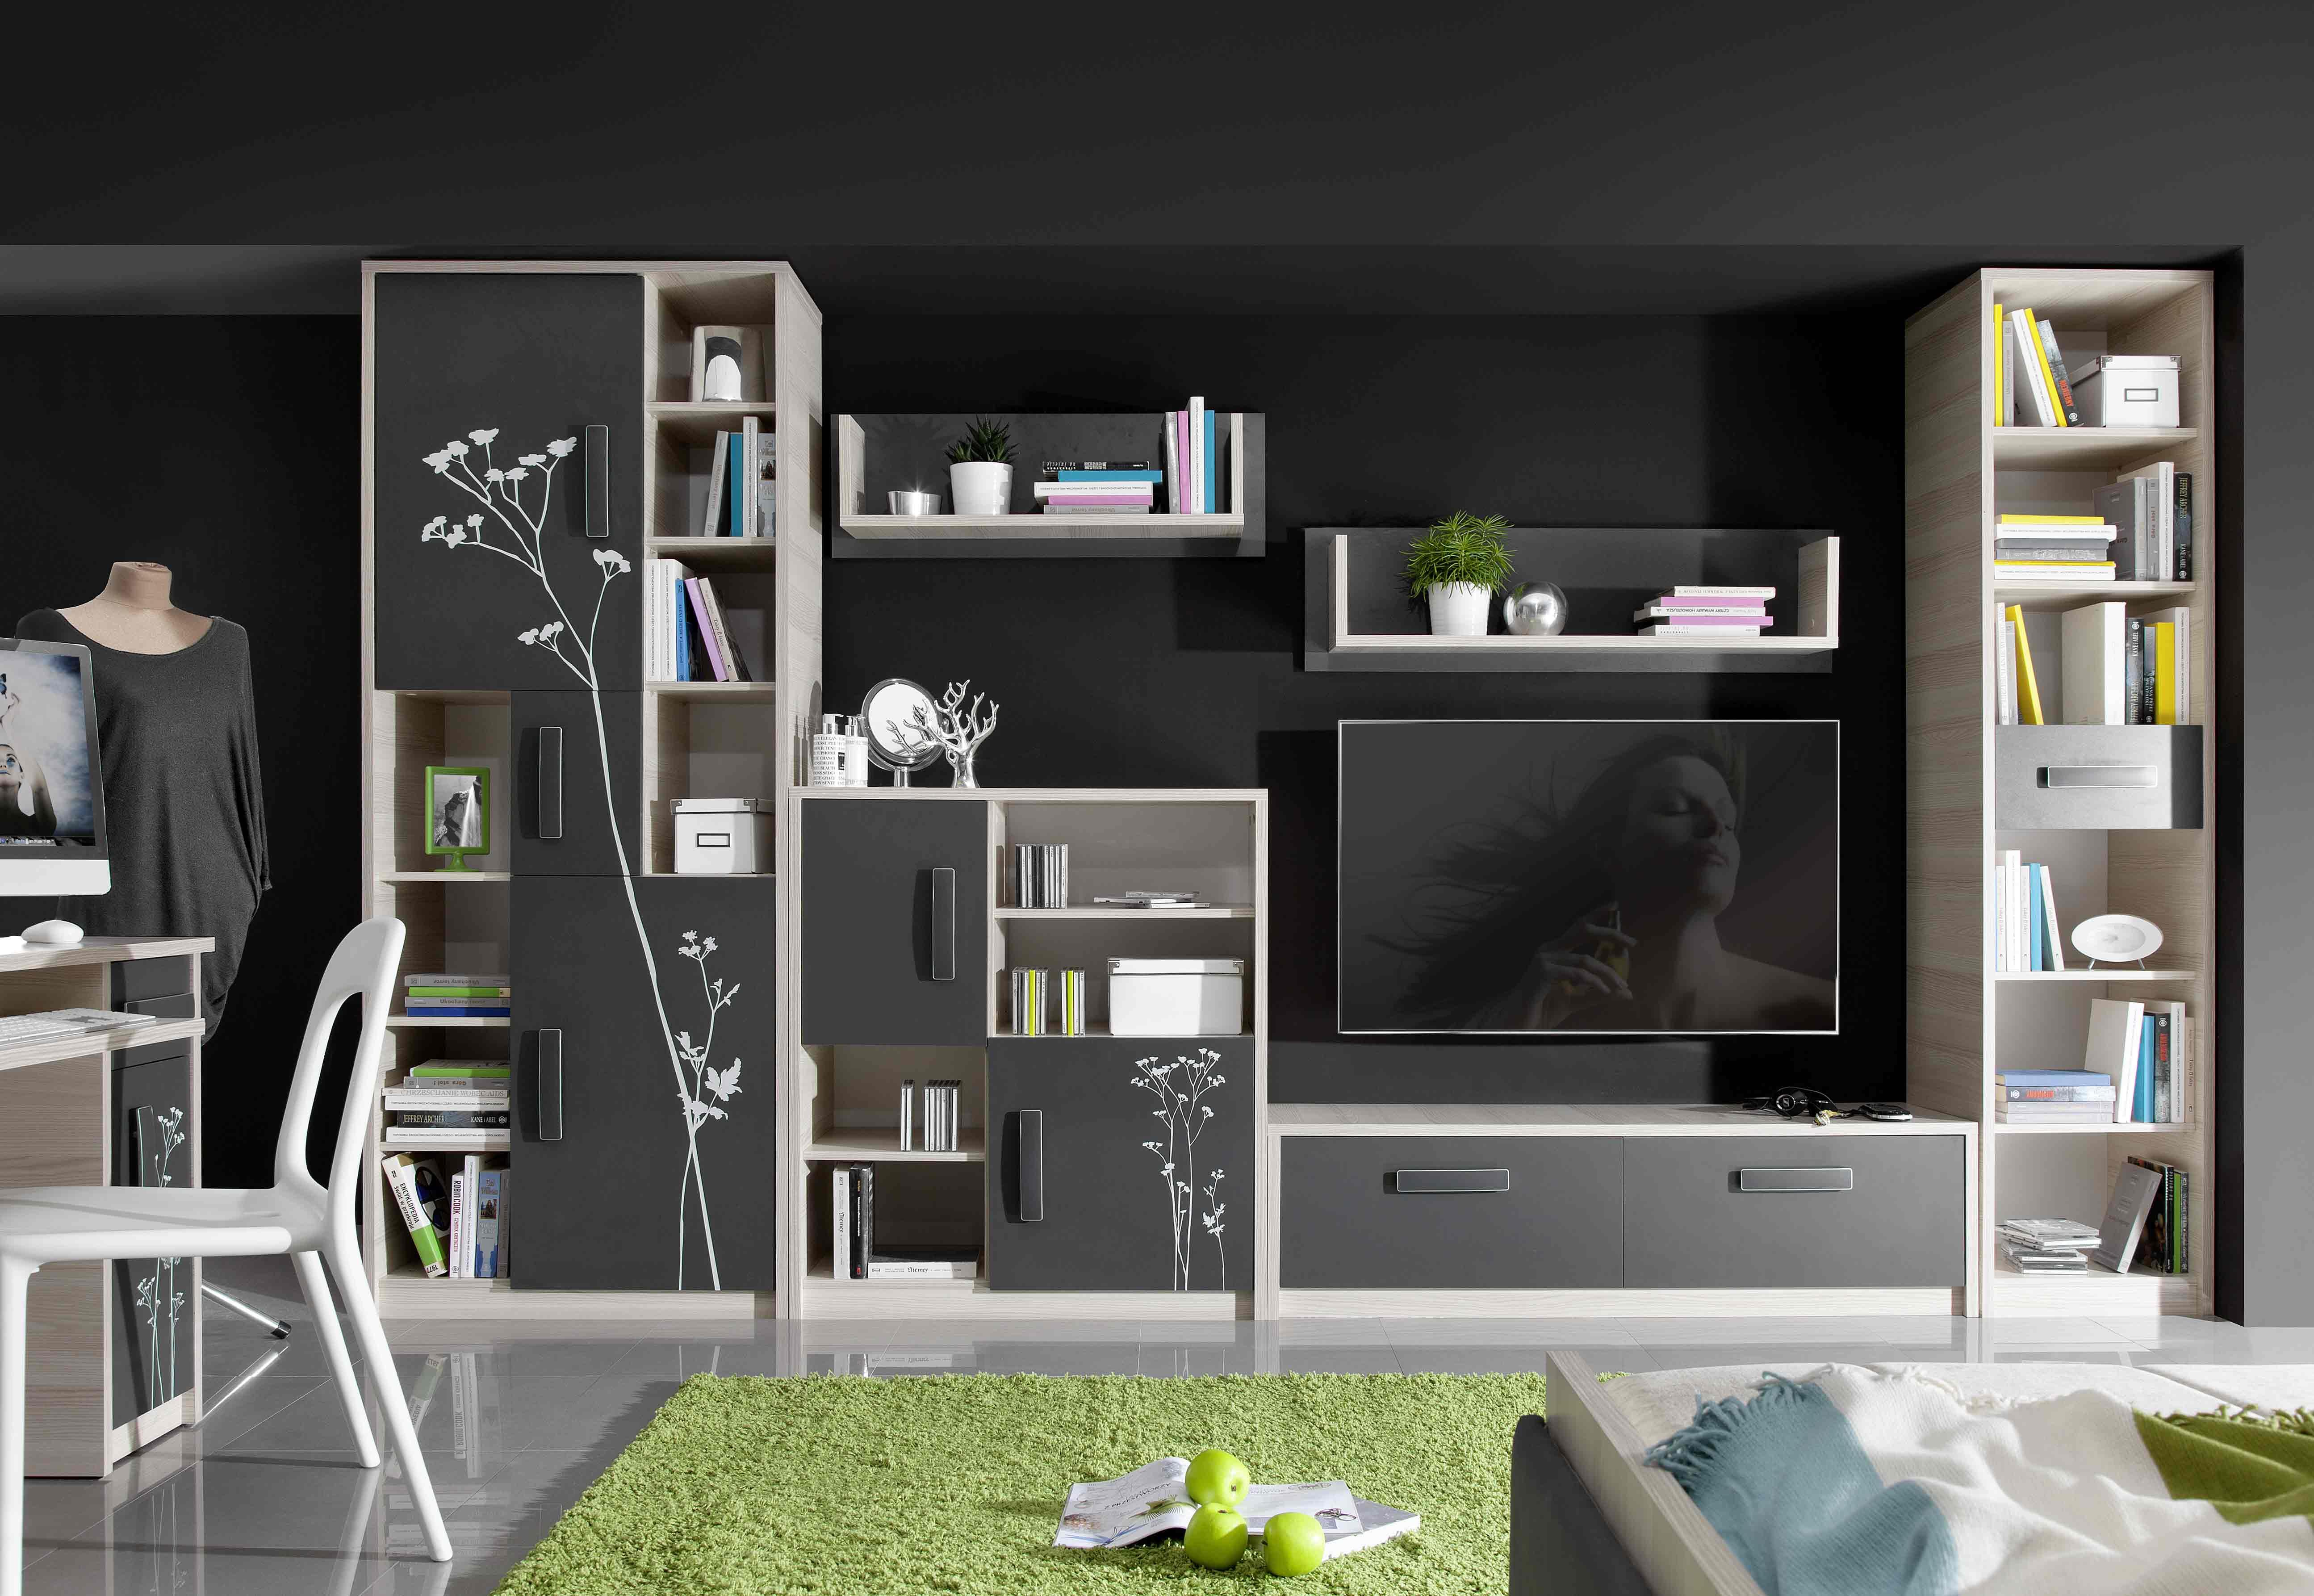 9570a21f6f28b BREGI detská izba, jaseň/grafit, AKCIA detská izba + otočná stolička Q-122  za 1€